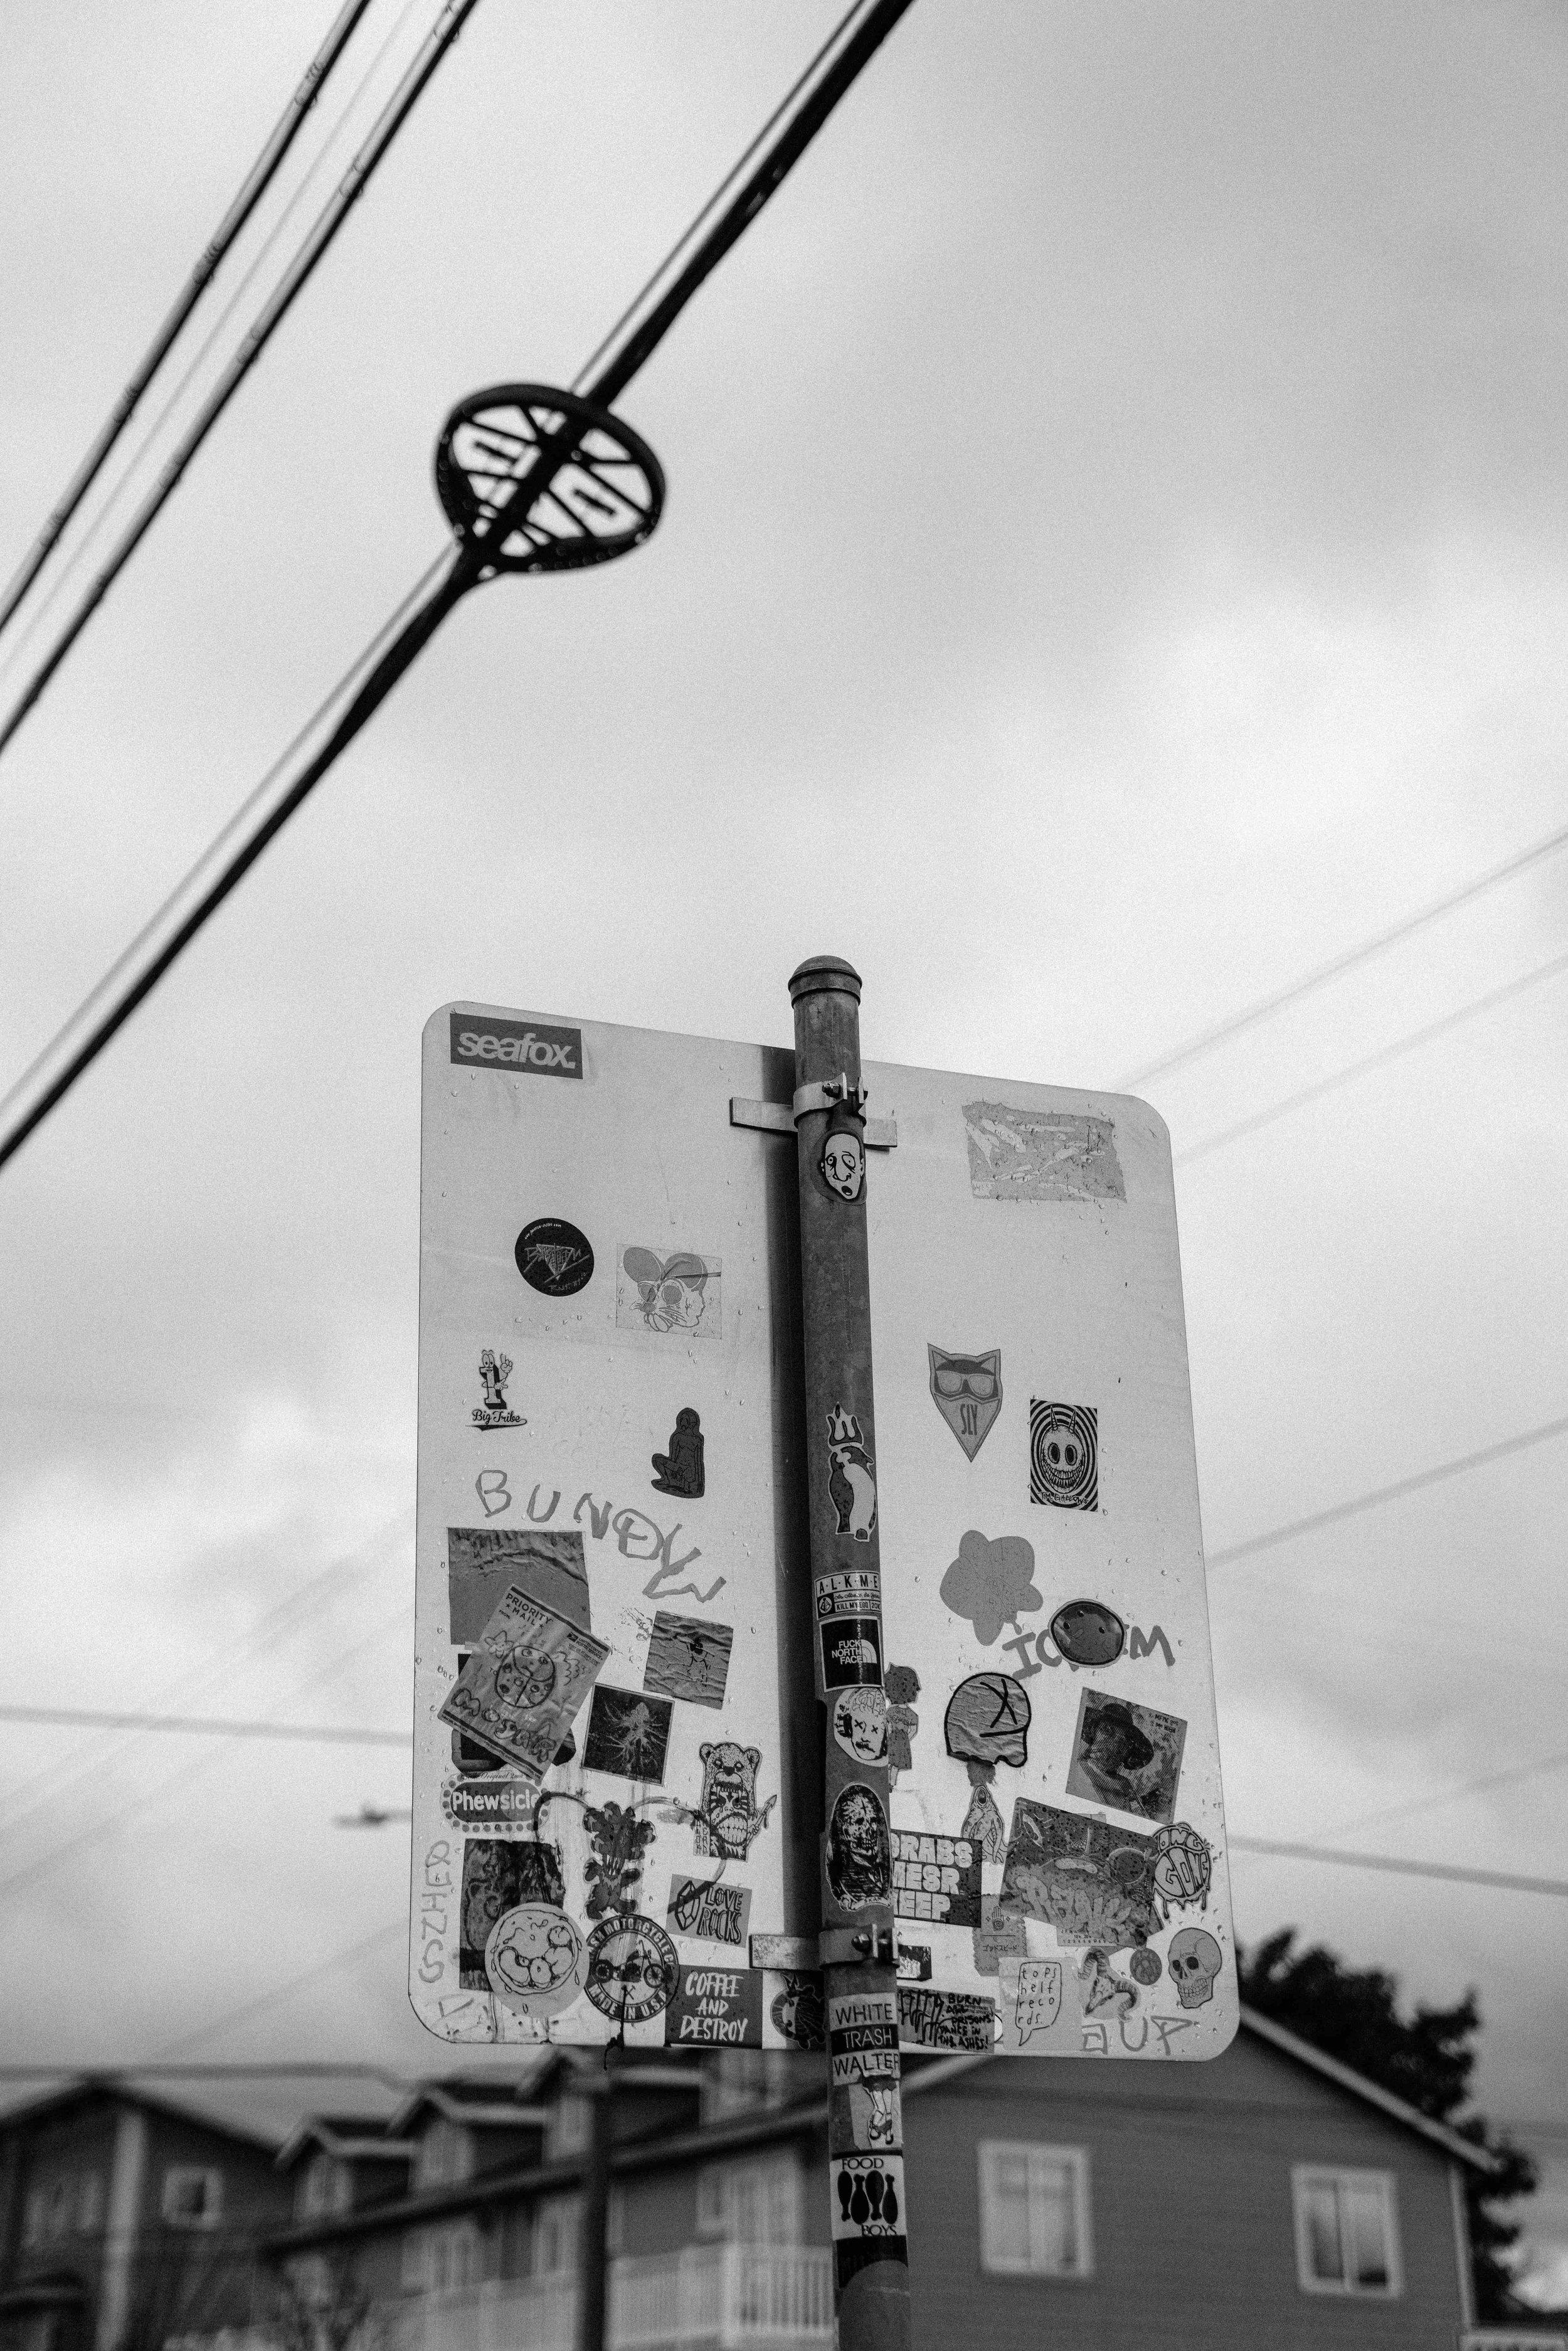 culture-crush-josue-rivas-portland-street-sign.jpg